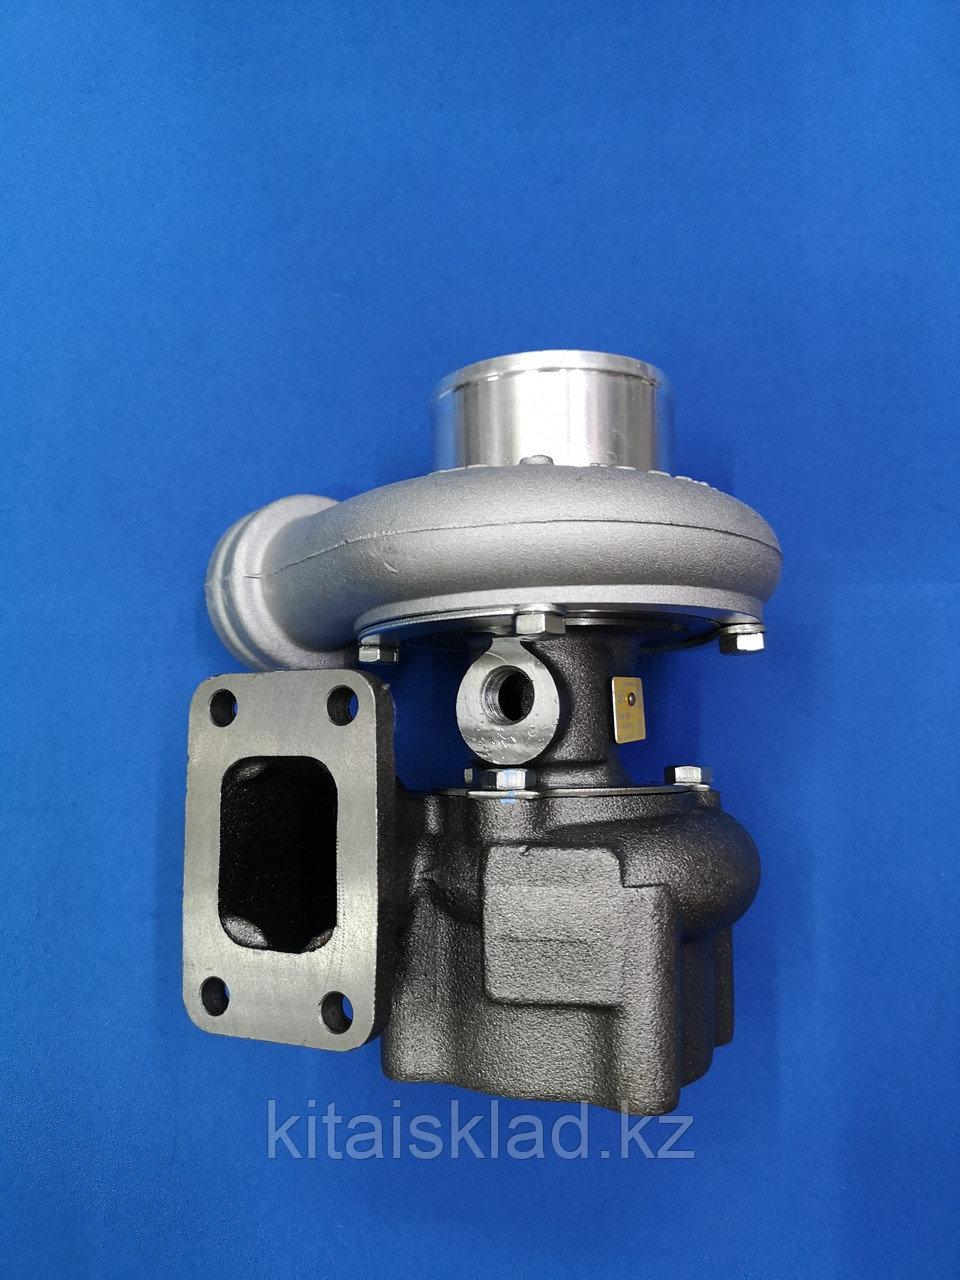 Турбина 04254537KZ 04258205KZ, двигатель BF4M2012C VOLVO PENTA SCHIFF